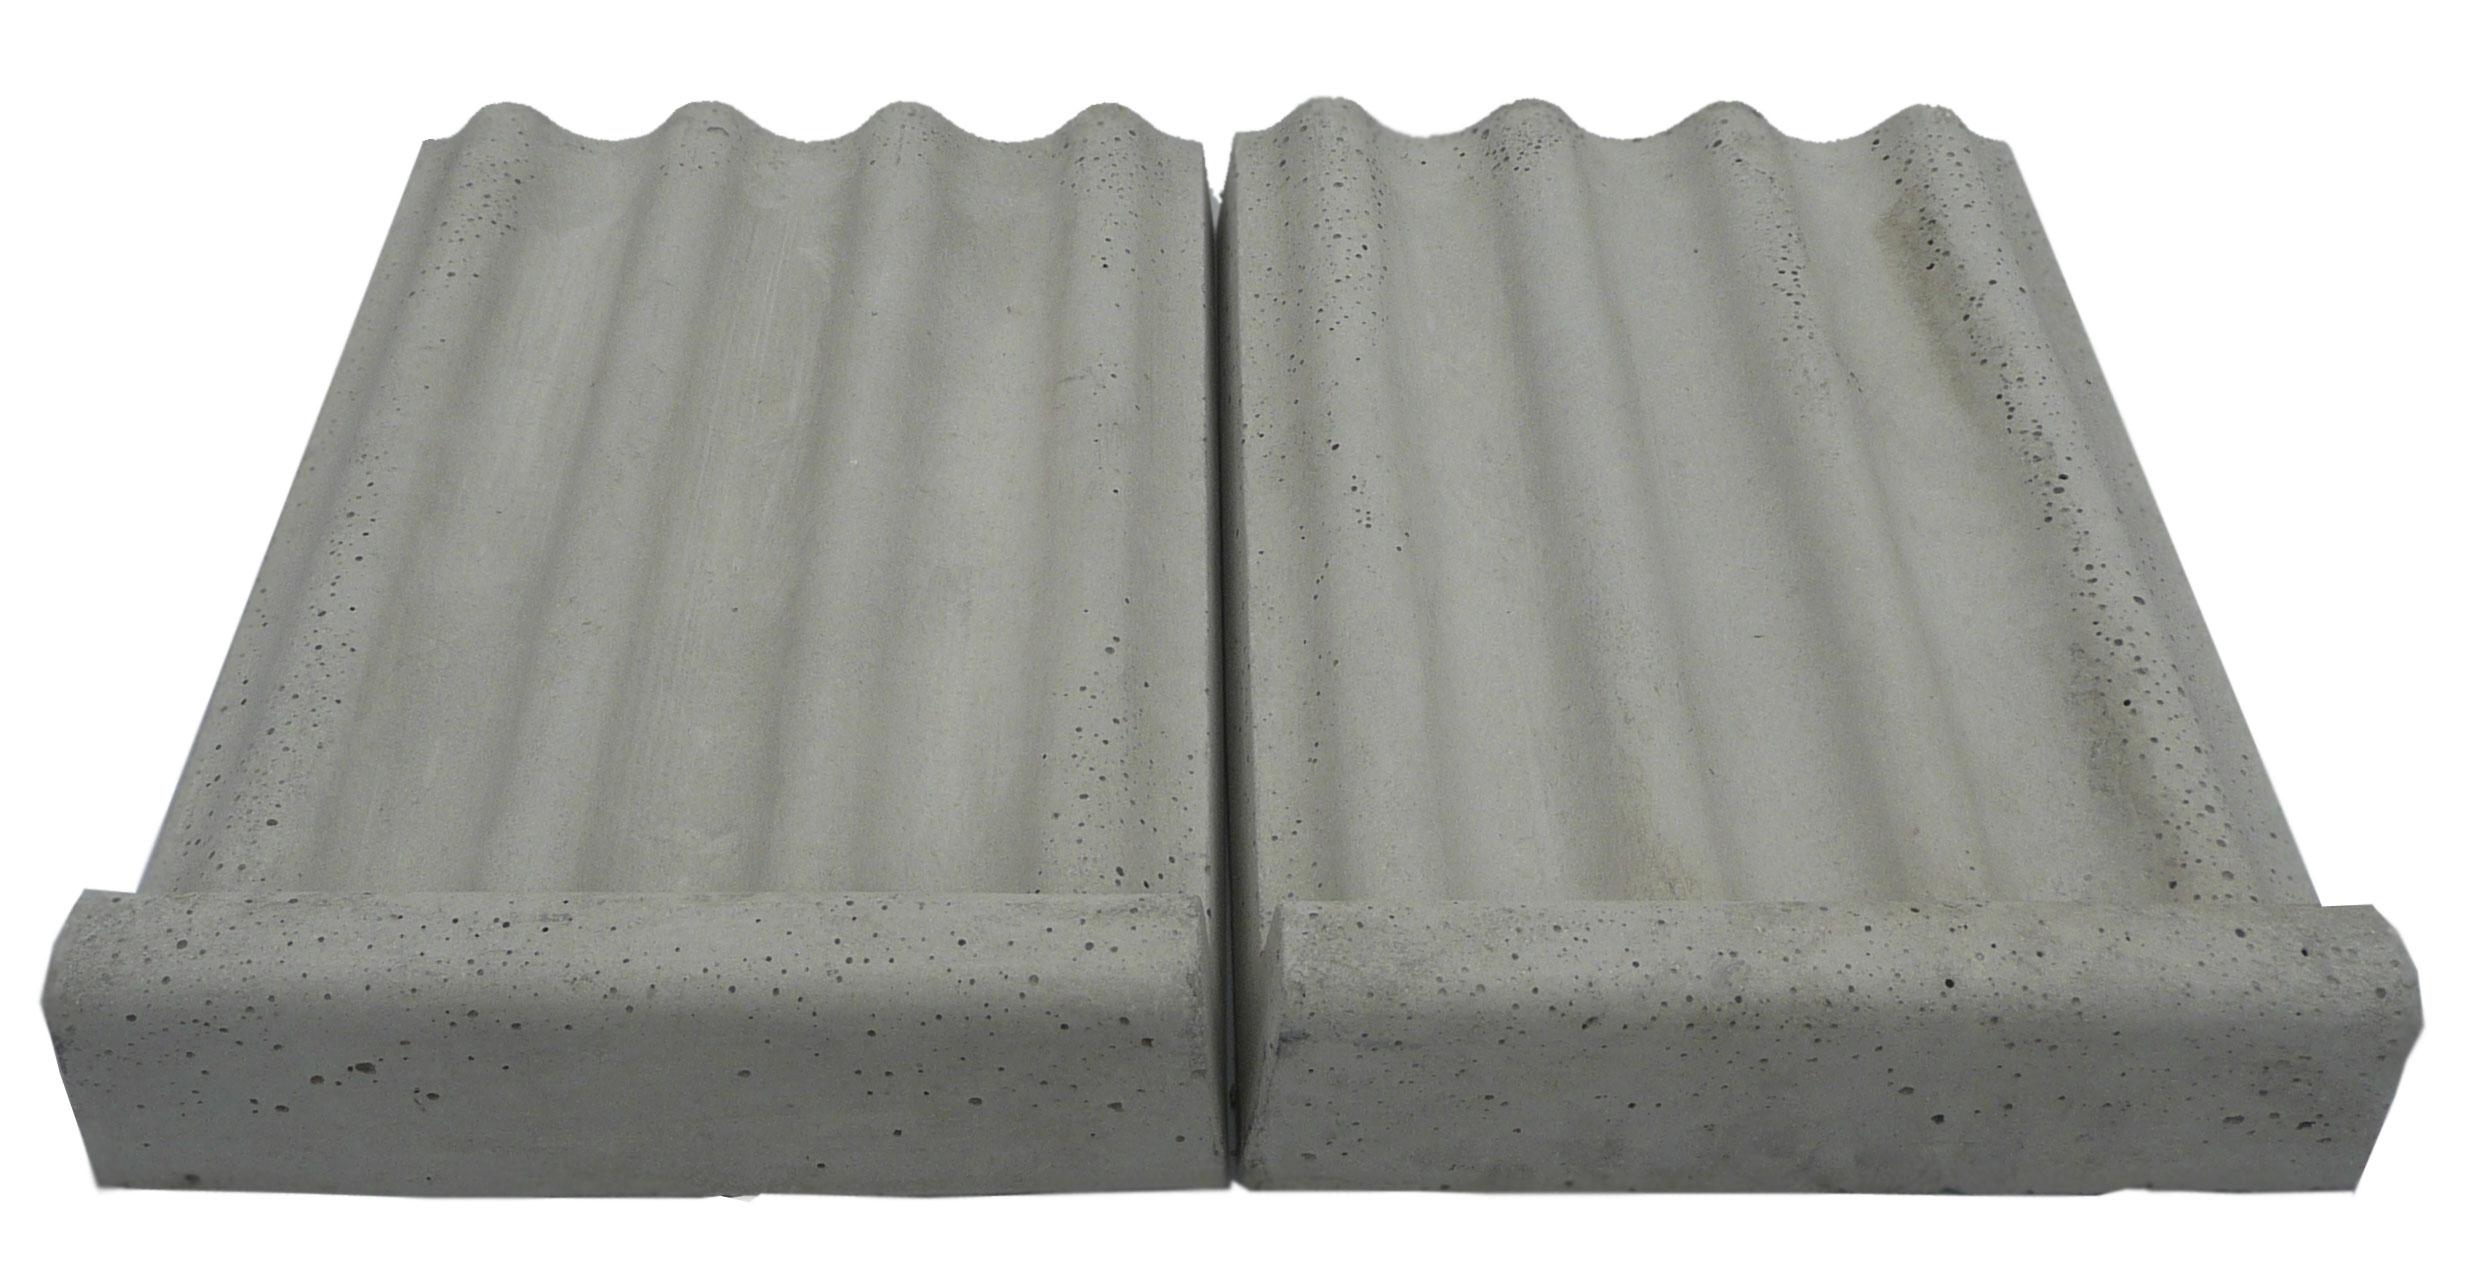 wellfire feuerplatte f r grillkamin siesta 2 teilig 52x35cm bei. Black Bedroom Furniture Sets. Home Design Ideas